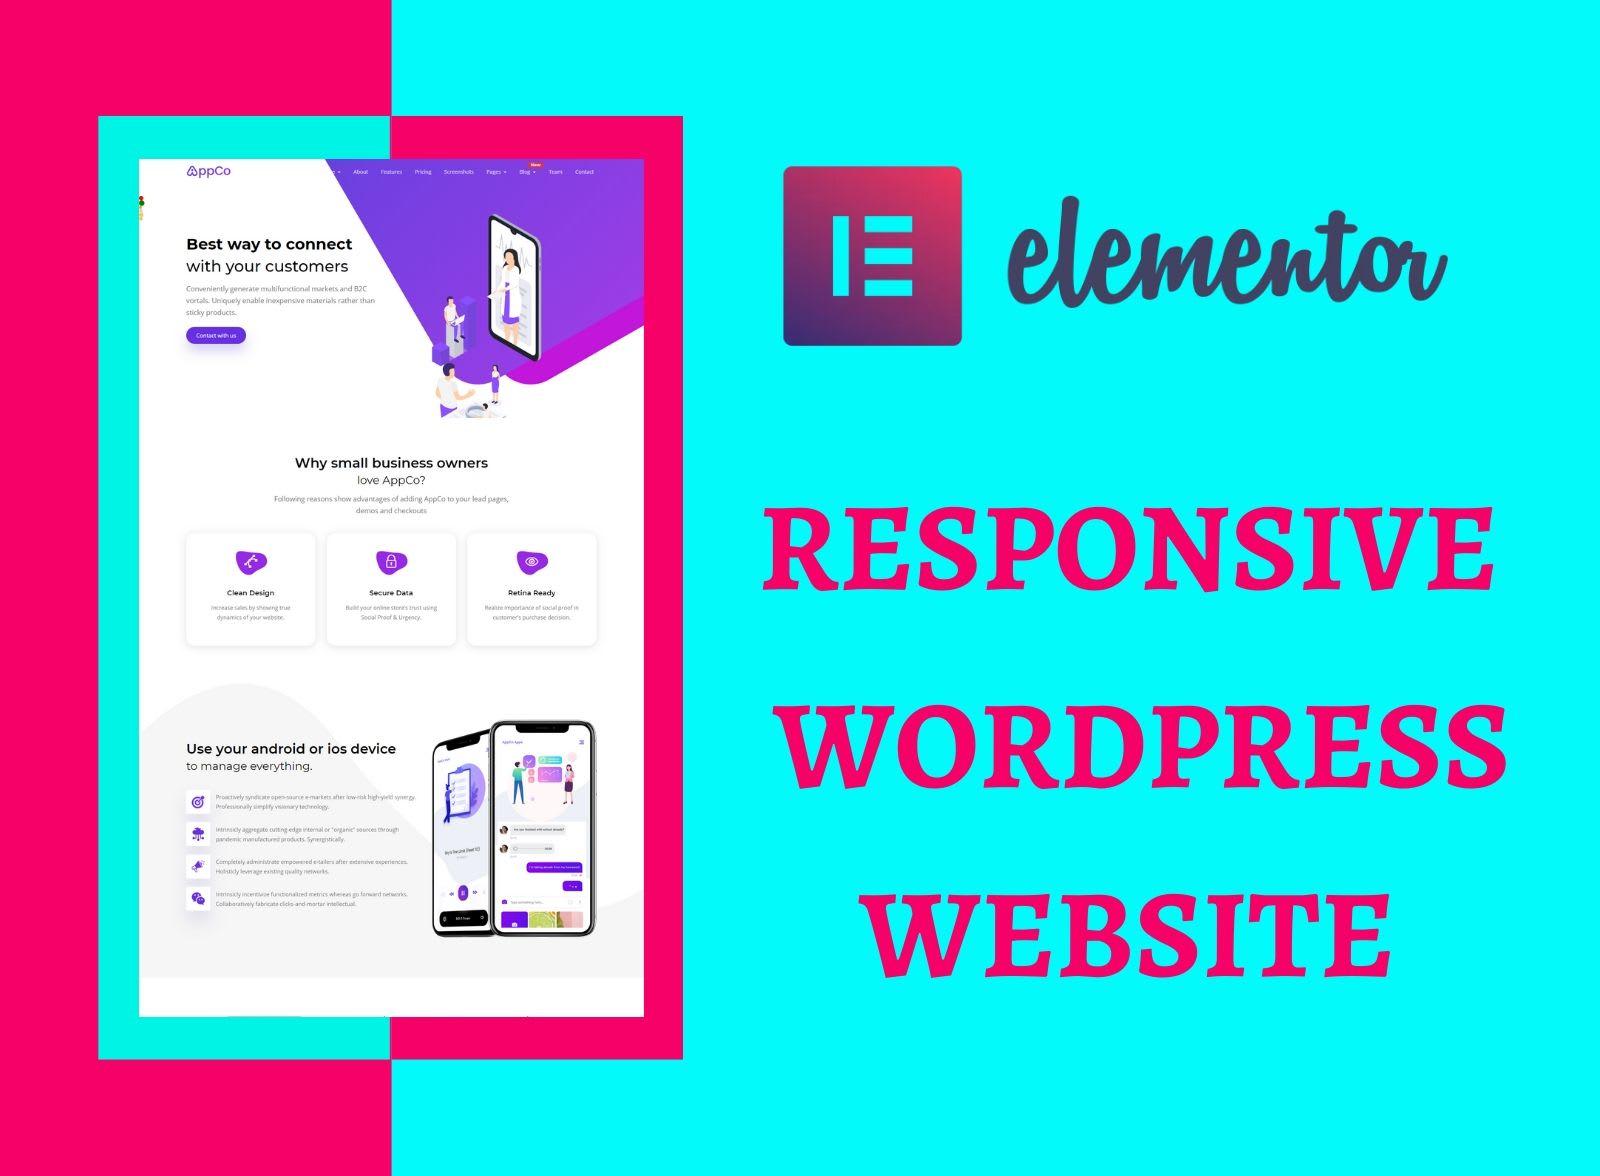 I will do create a responsive WordPress website design